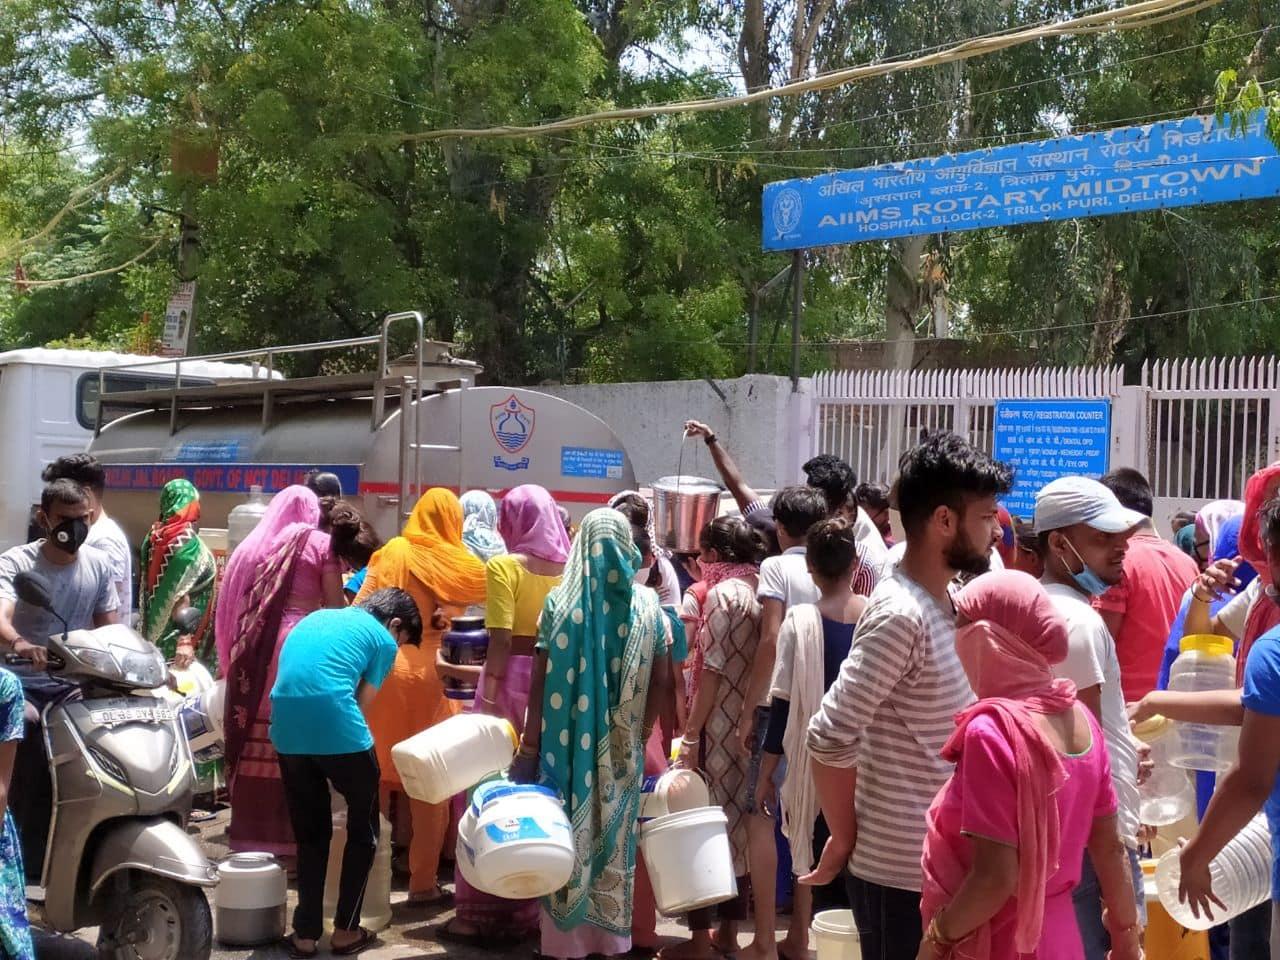 India lockdown amid coronavirus scare